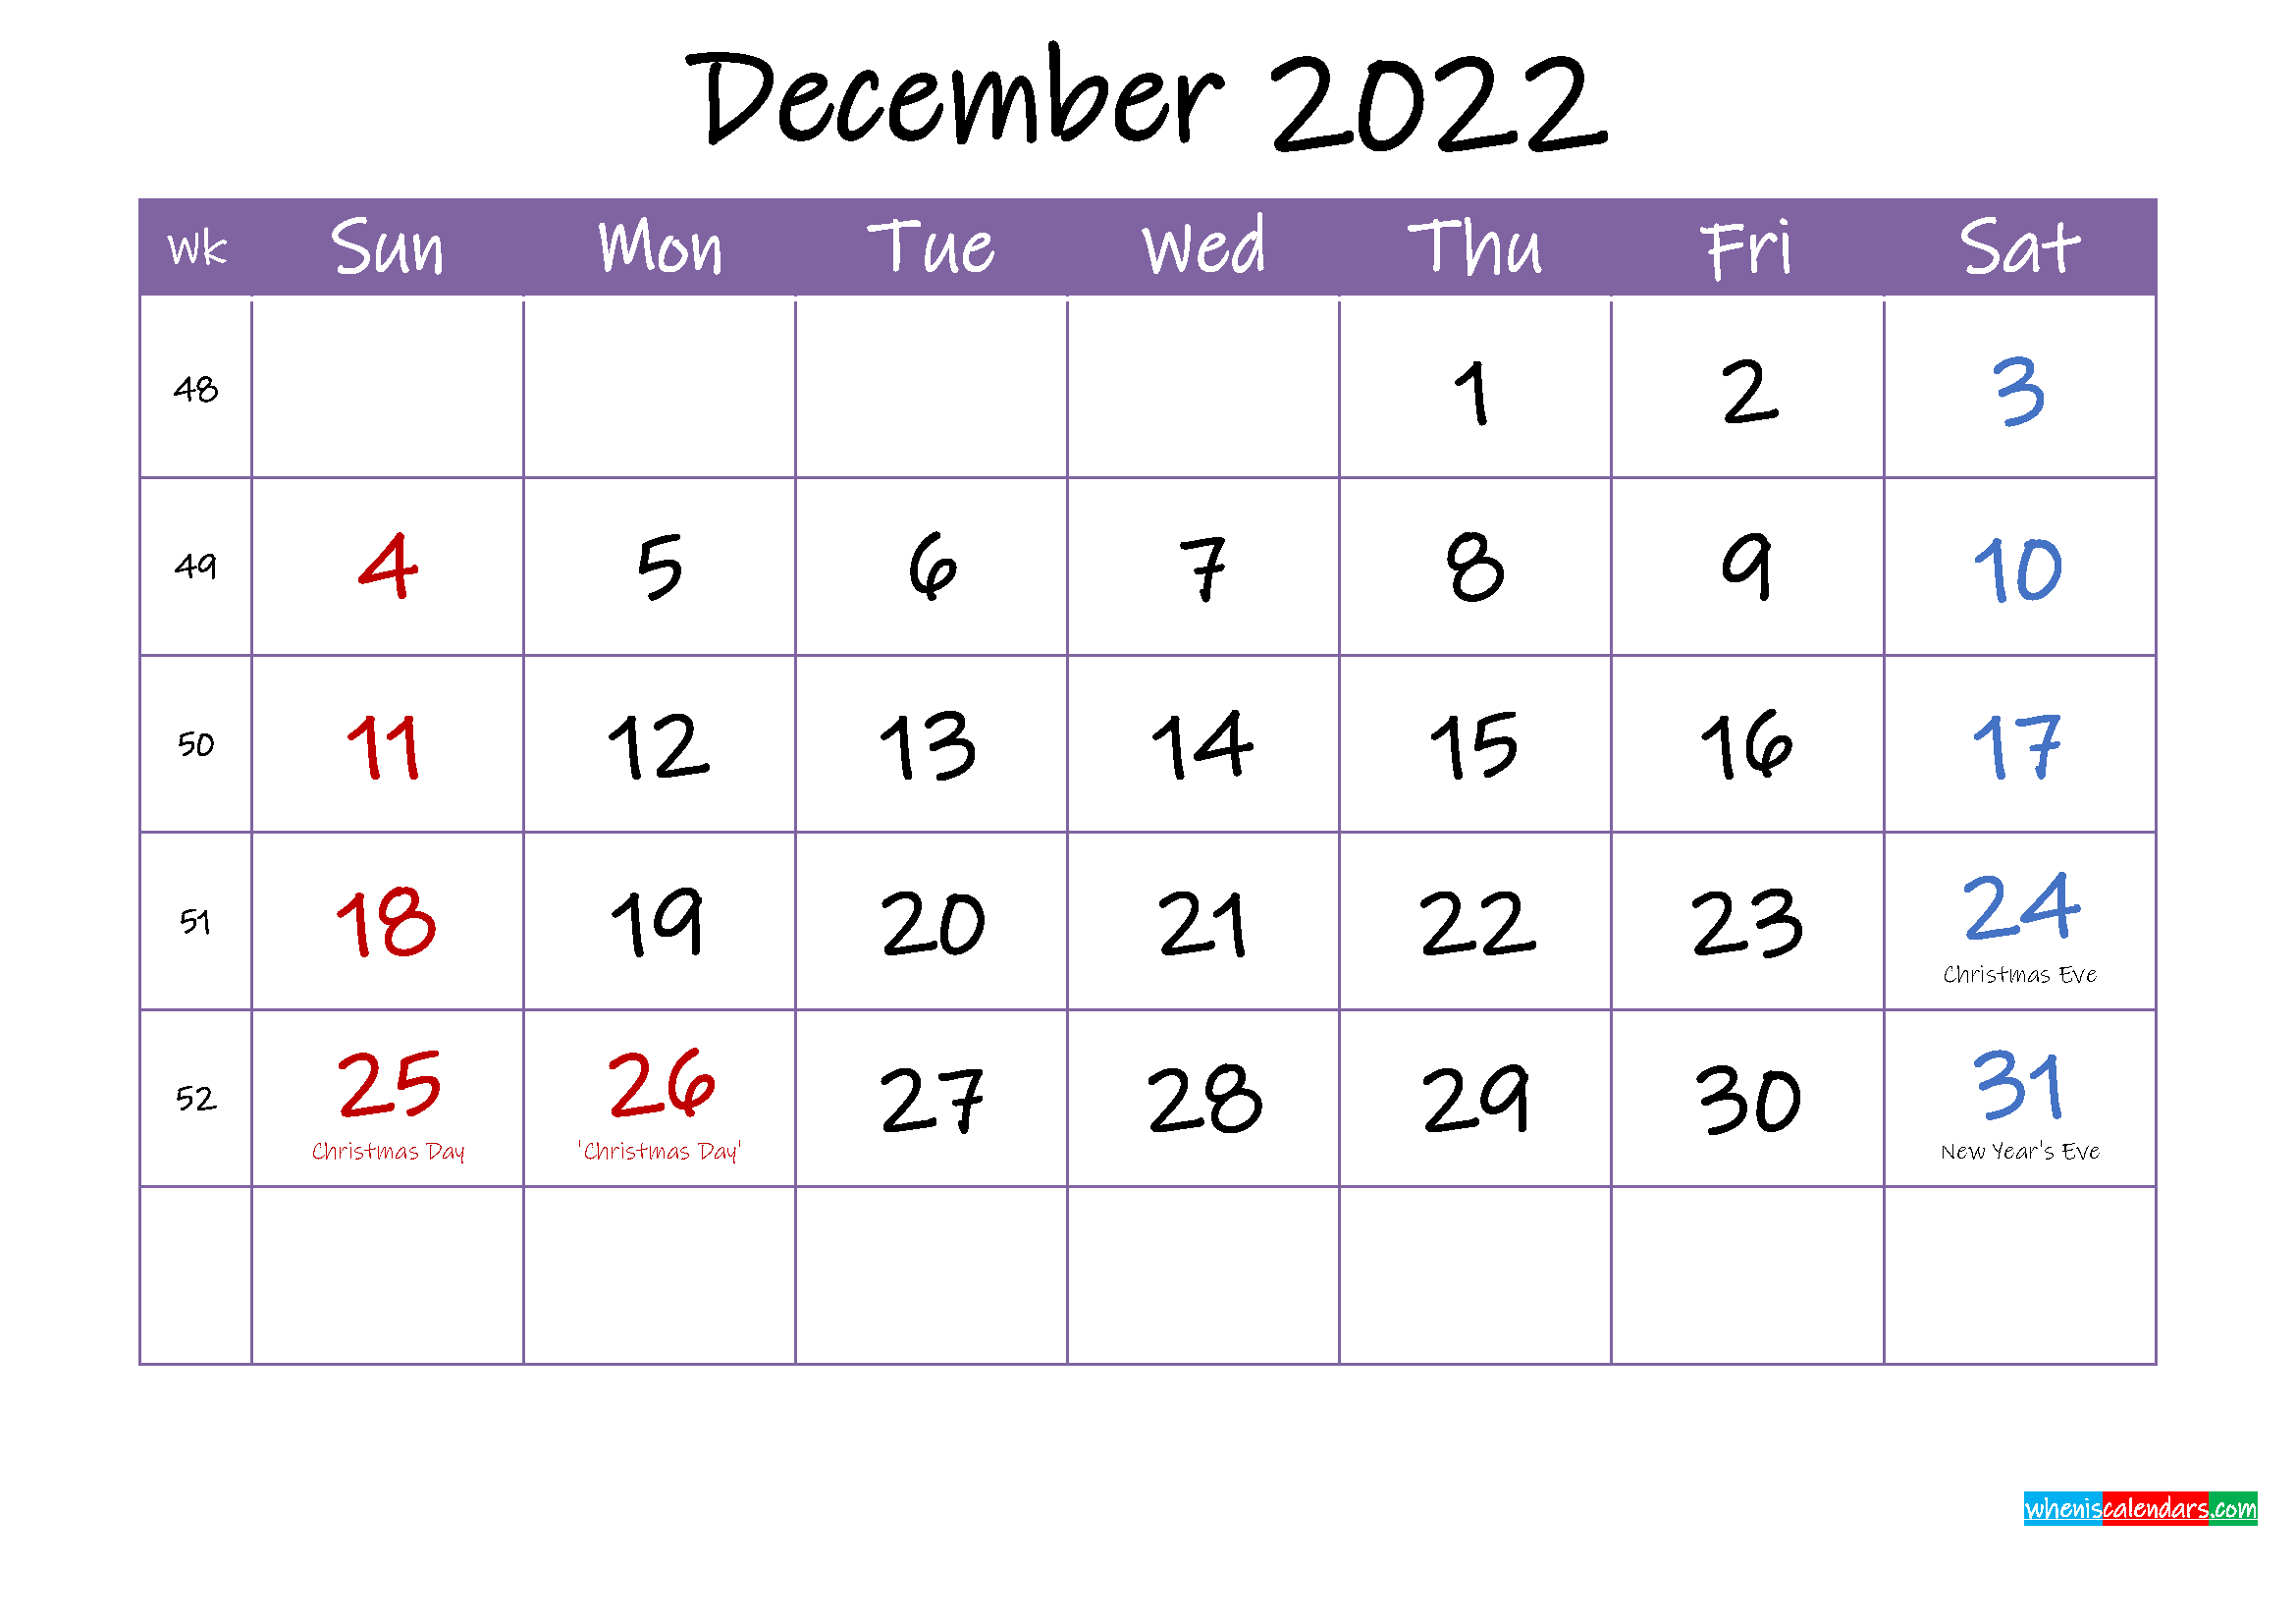 December 2022 Calendar with Holidays Printable